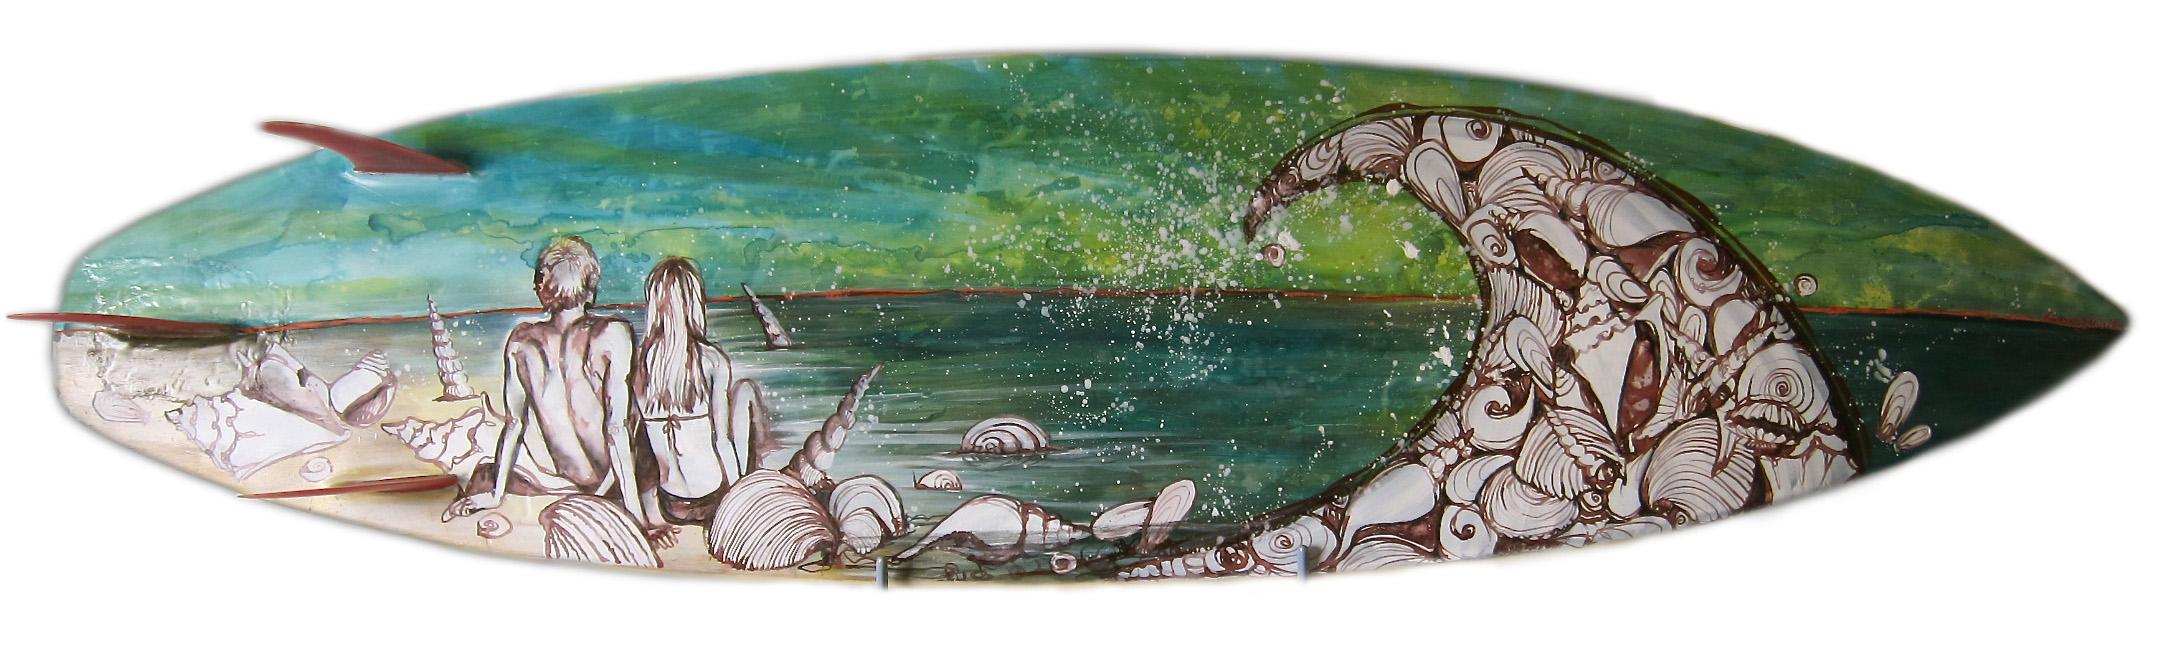 surfboard pic.jpg